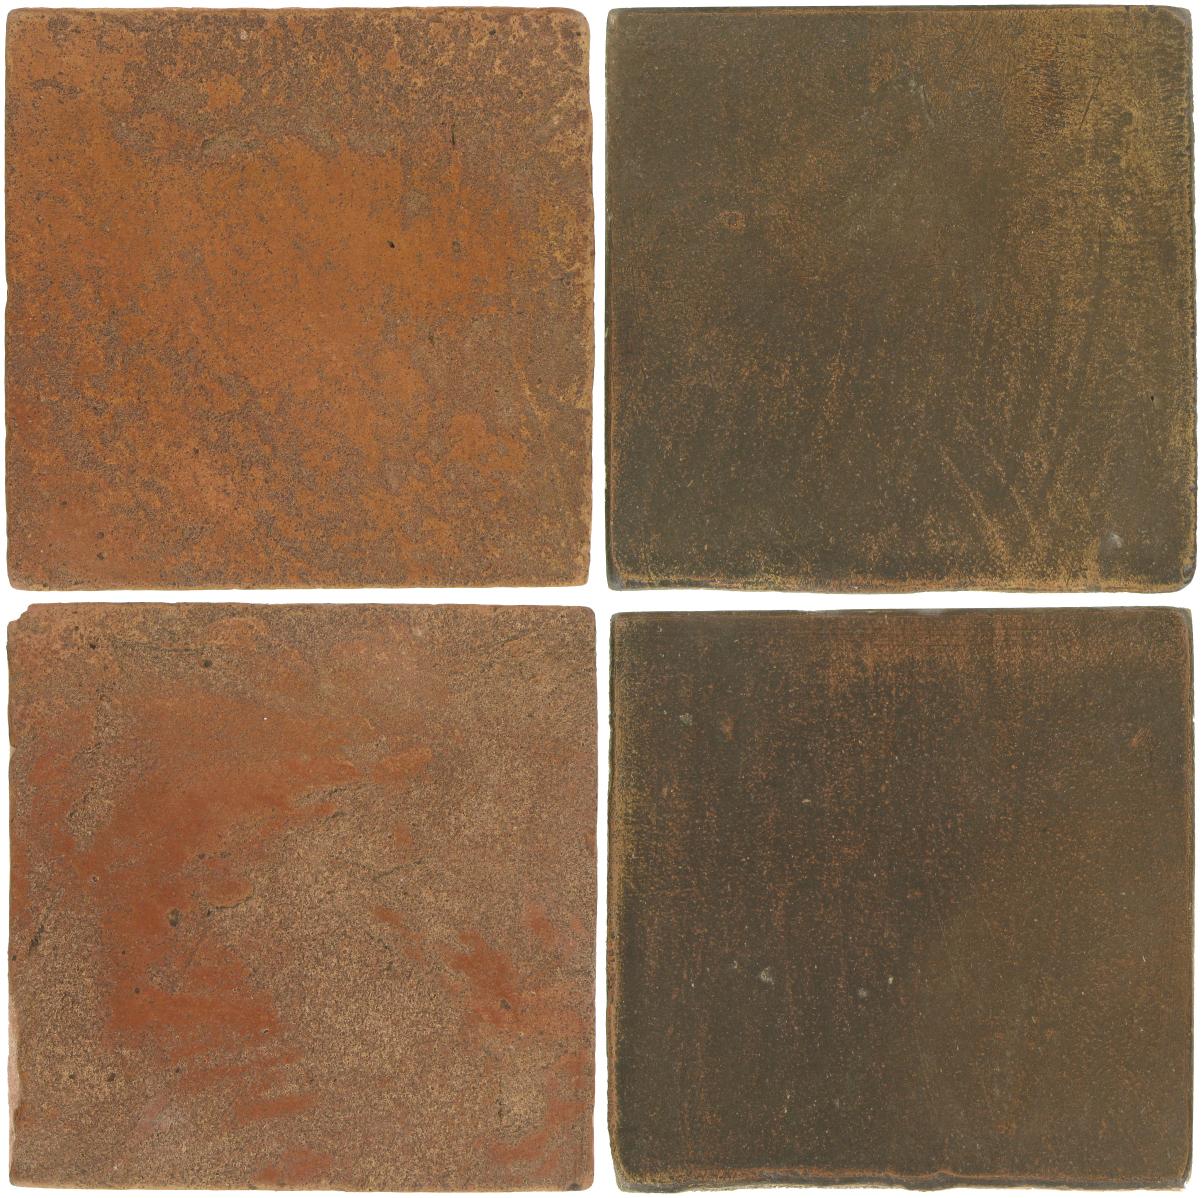 Pedralbes Antique Terracotta  2 Color Combinations  VTG-PSTR Traditional + OHS-PSVN Verona Brown